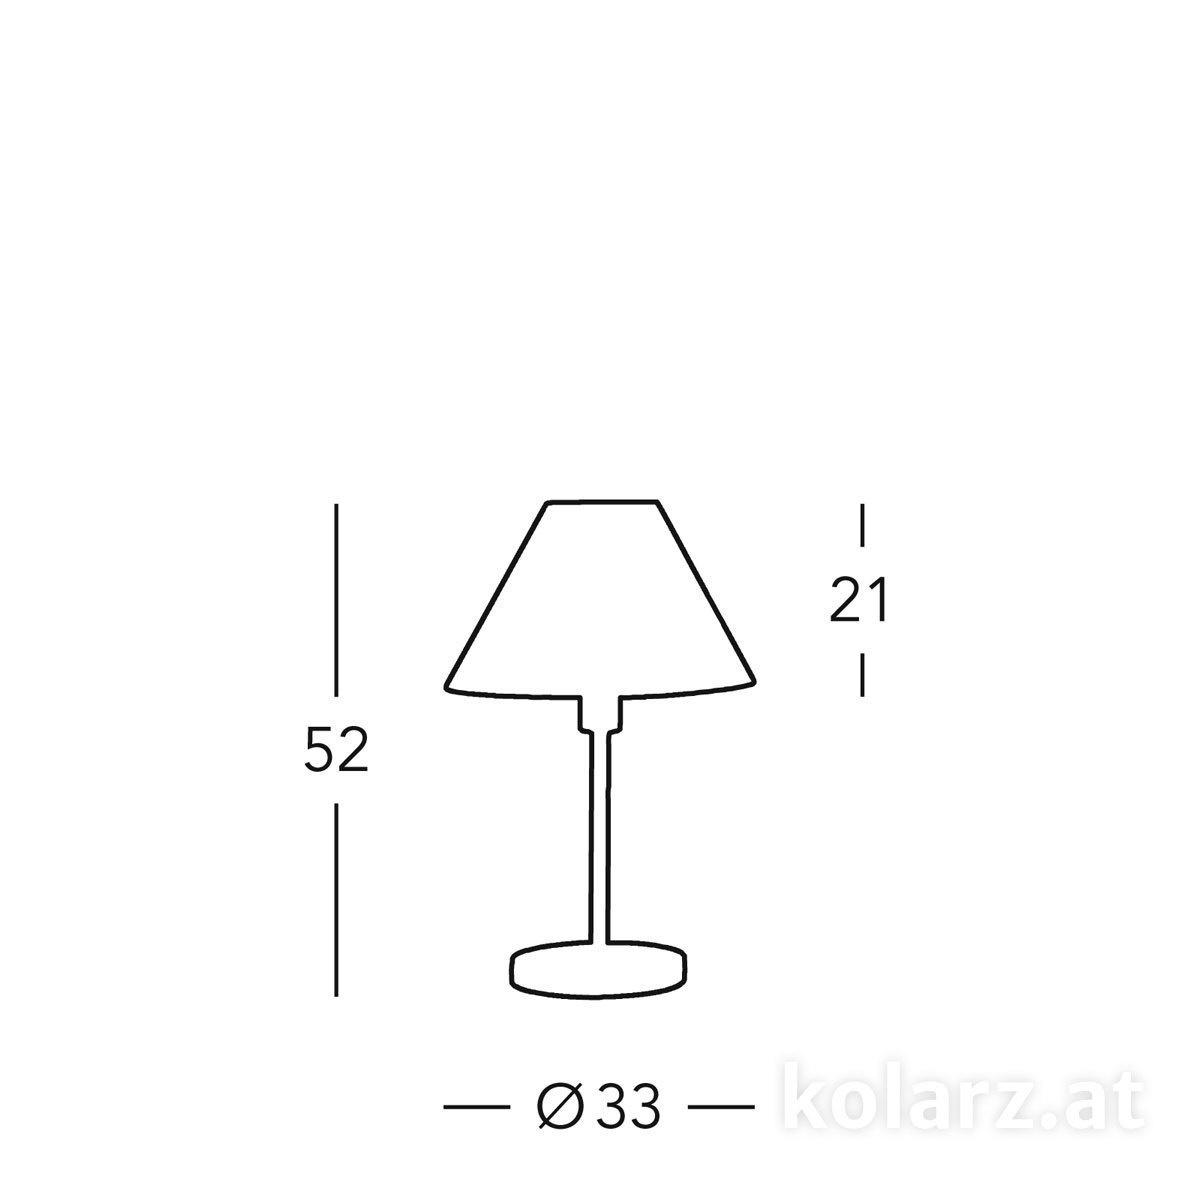 264-70-4-s1.jpg